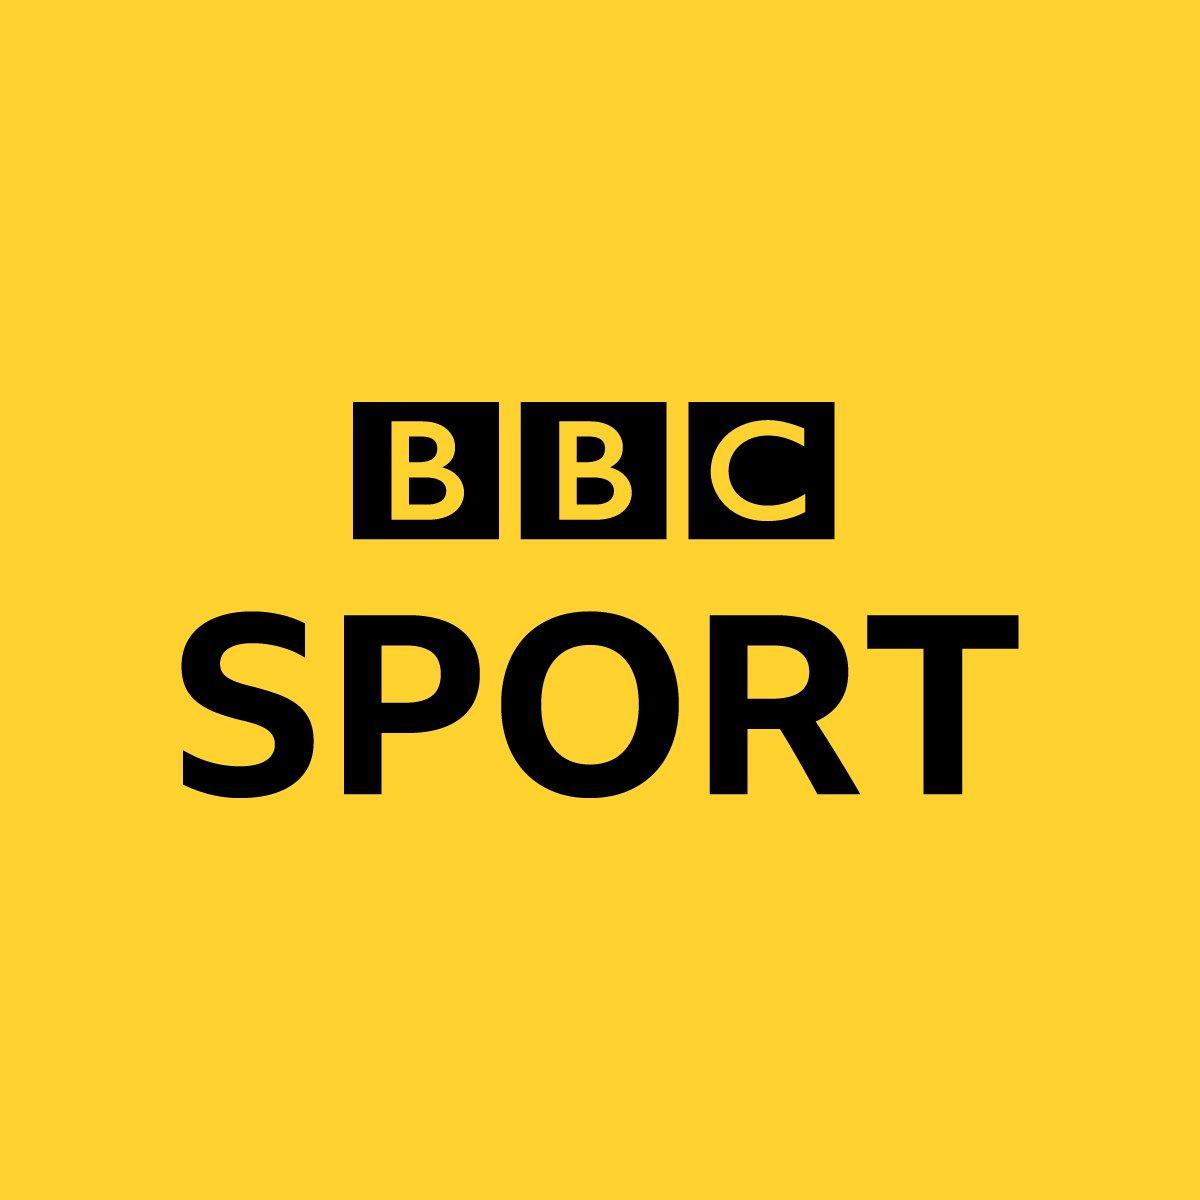 test Twitter Media - https://t.co/5zeRCnANSU live FA Cup: Blackburn Rovers 2-4 Newcastle United (aet) highlights https://t.co/9eSBQypBiK bokep world series https://t.co/t68fJOtDN7